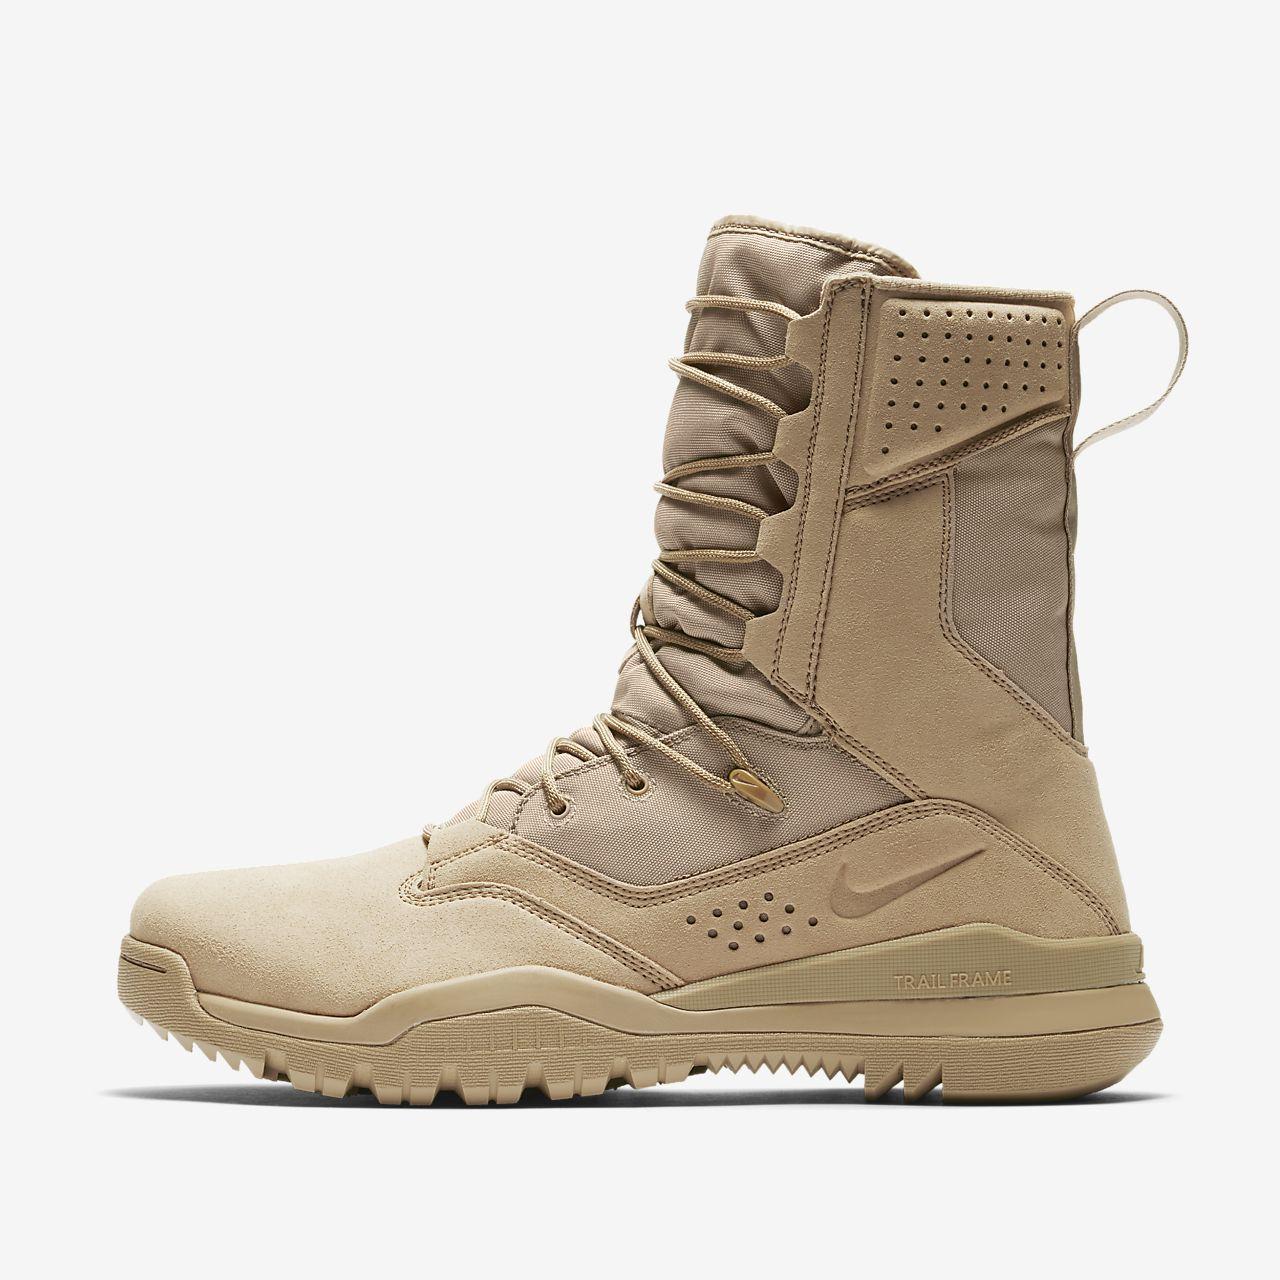 Nike SFB Field 2 (20 cm)-støvle